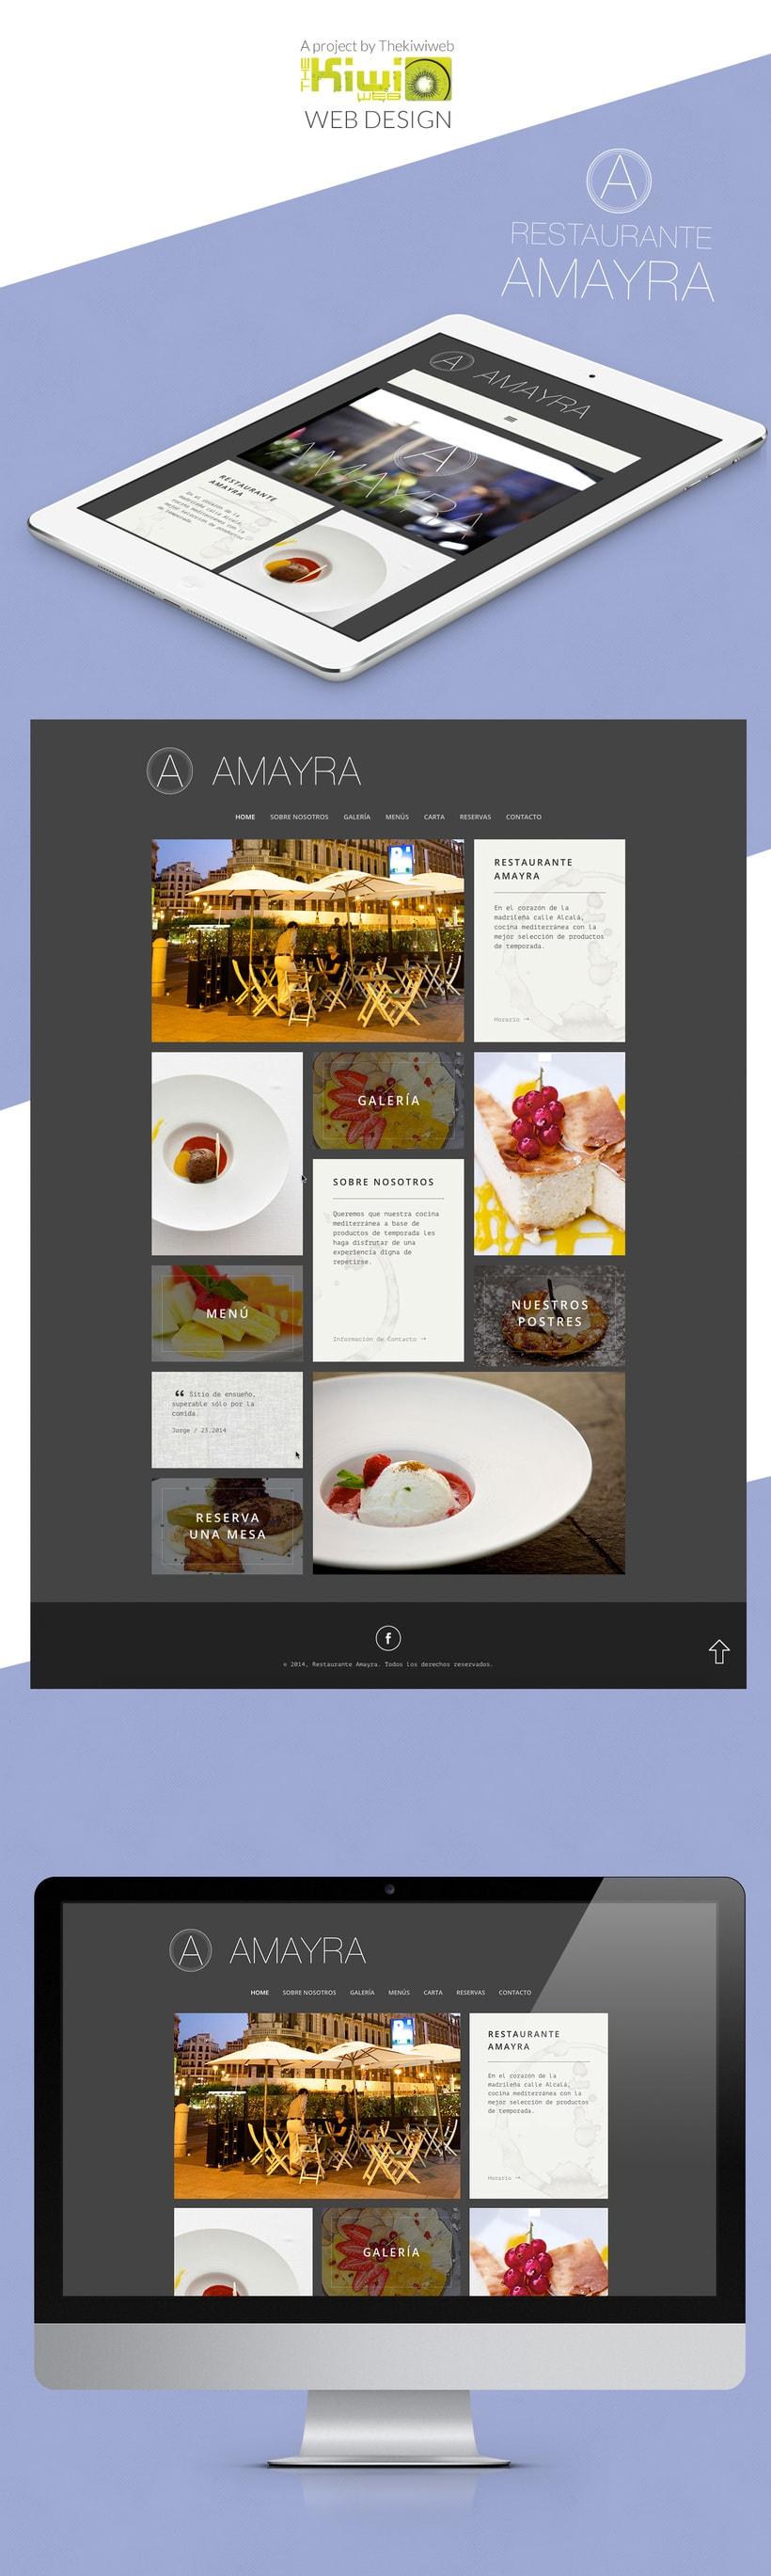 Restaurante Amayra Web Design 0